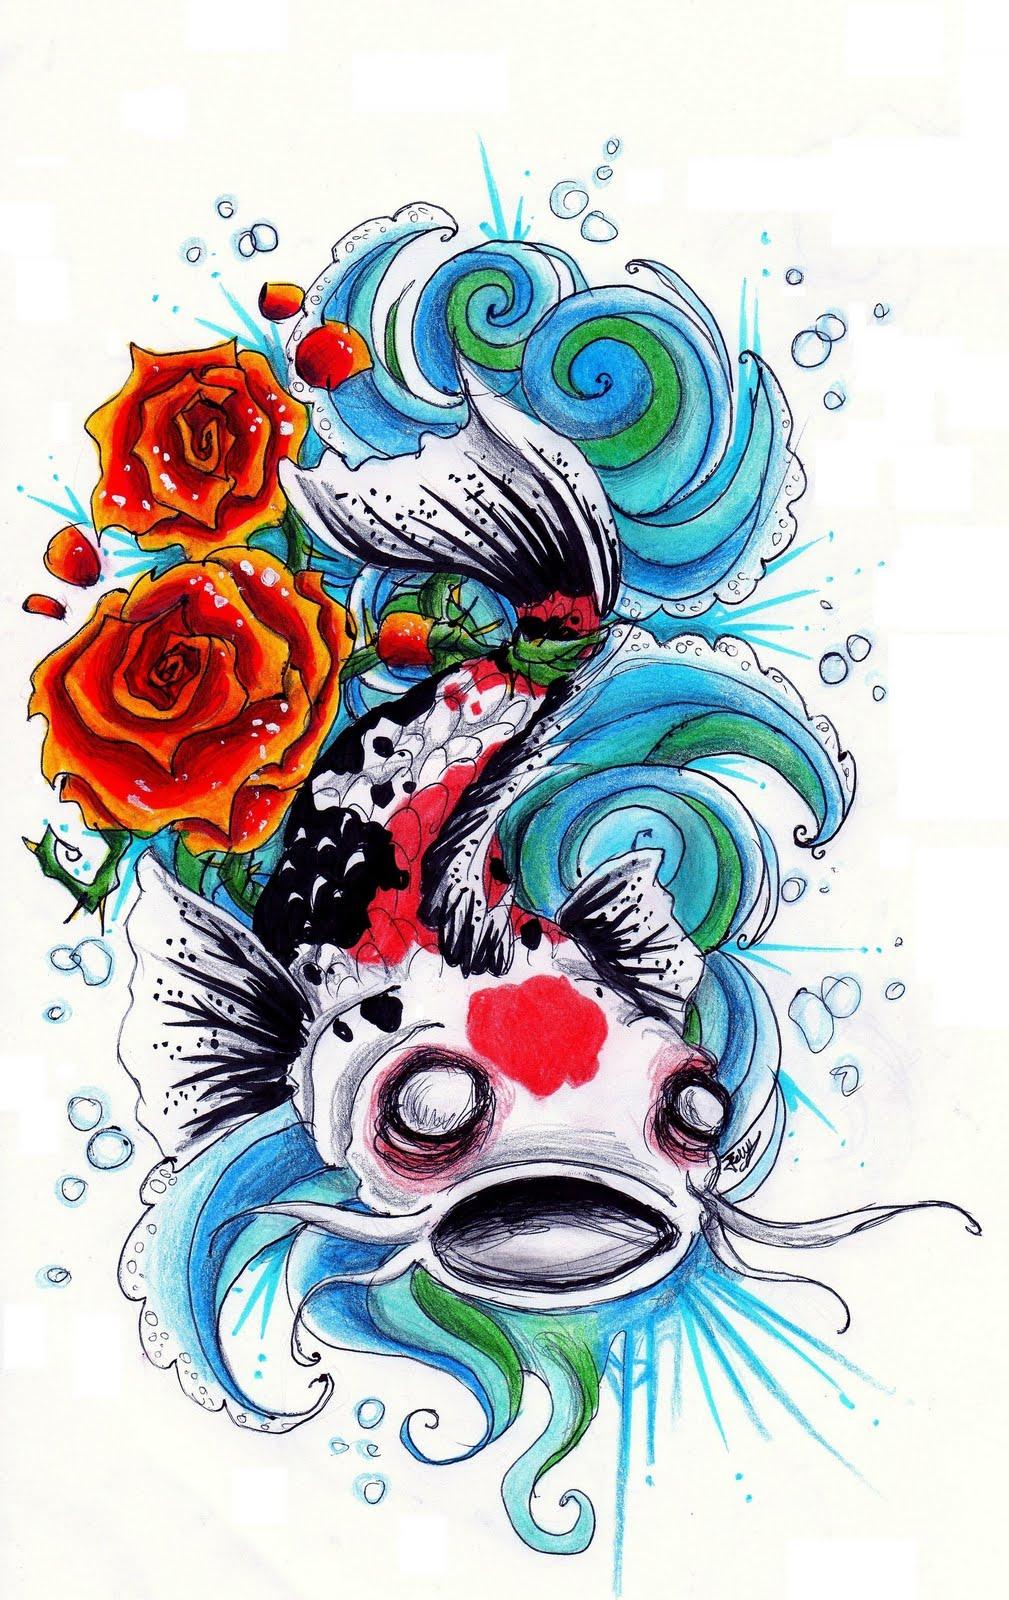 Koi fish splashing images for Koi fish design